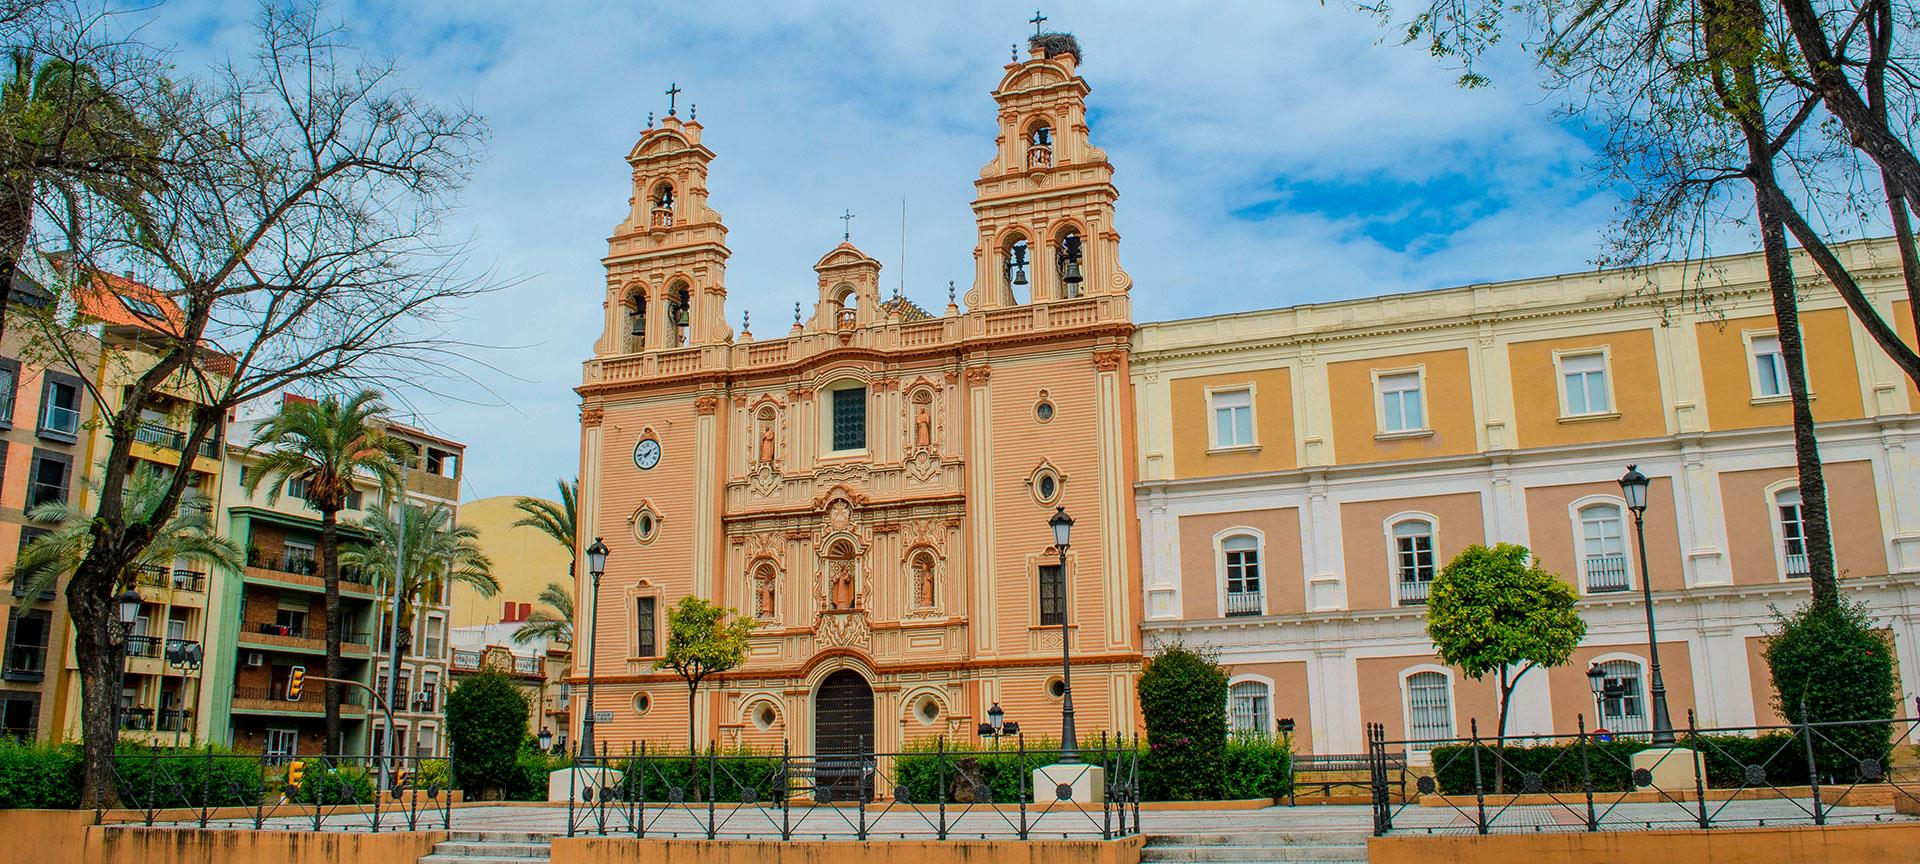 Essential Huelva Free Walking Tour